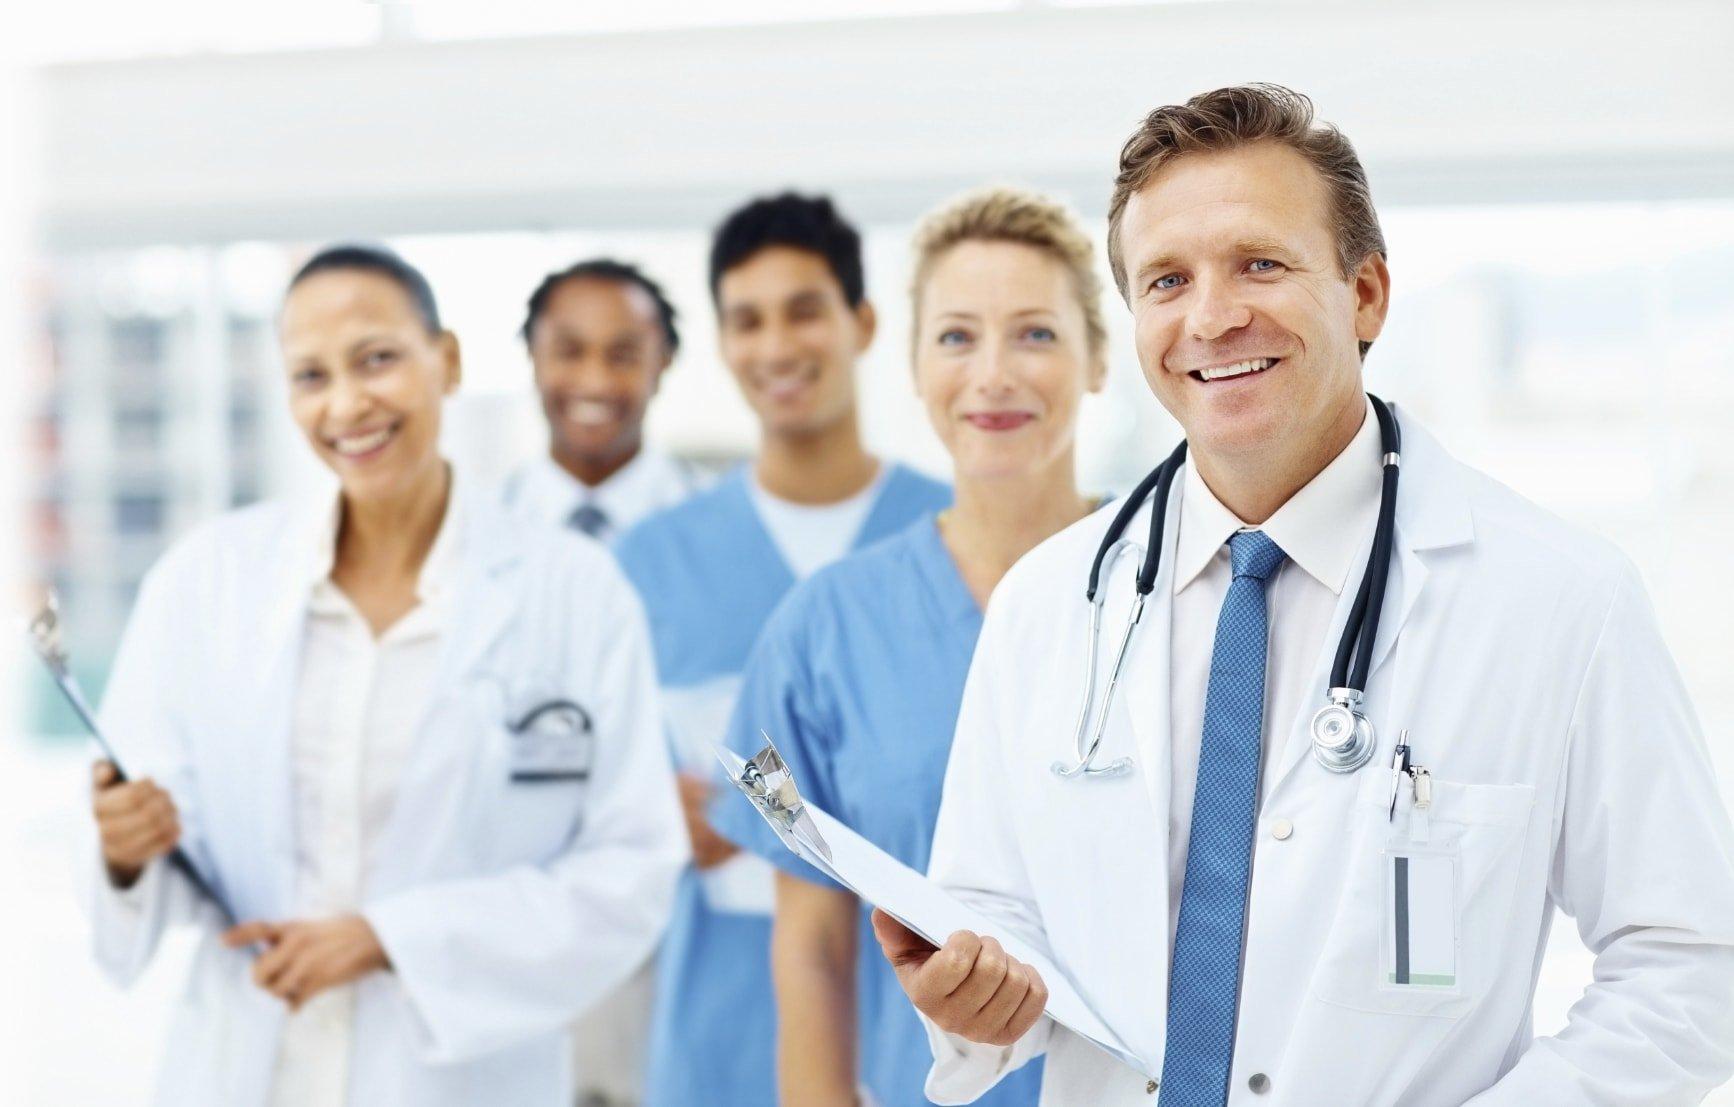 doctors medical team in hospital